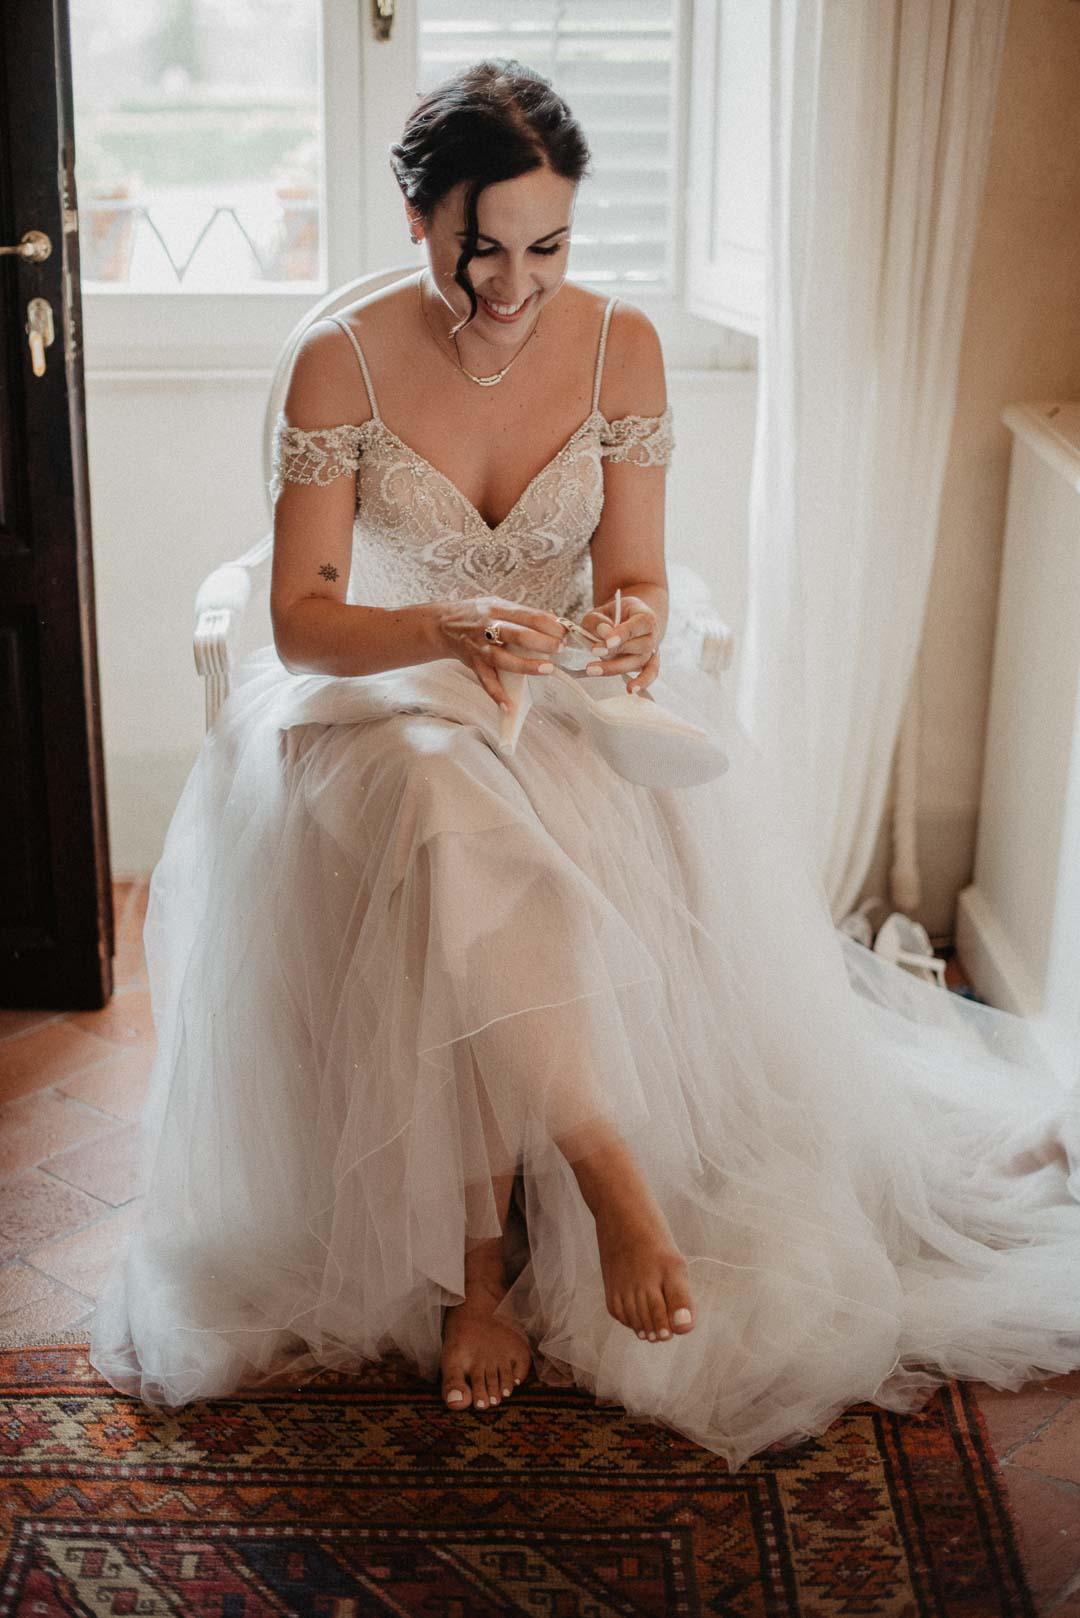 wedding-photographer-destination-fineart-bespoke-reportage-tuscany-villascorzi-vivianeizzo-spazio46-55